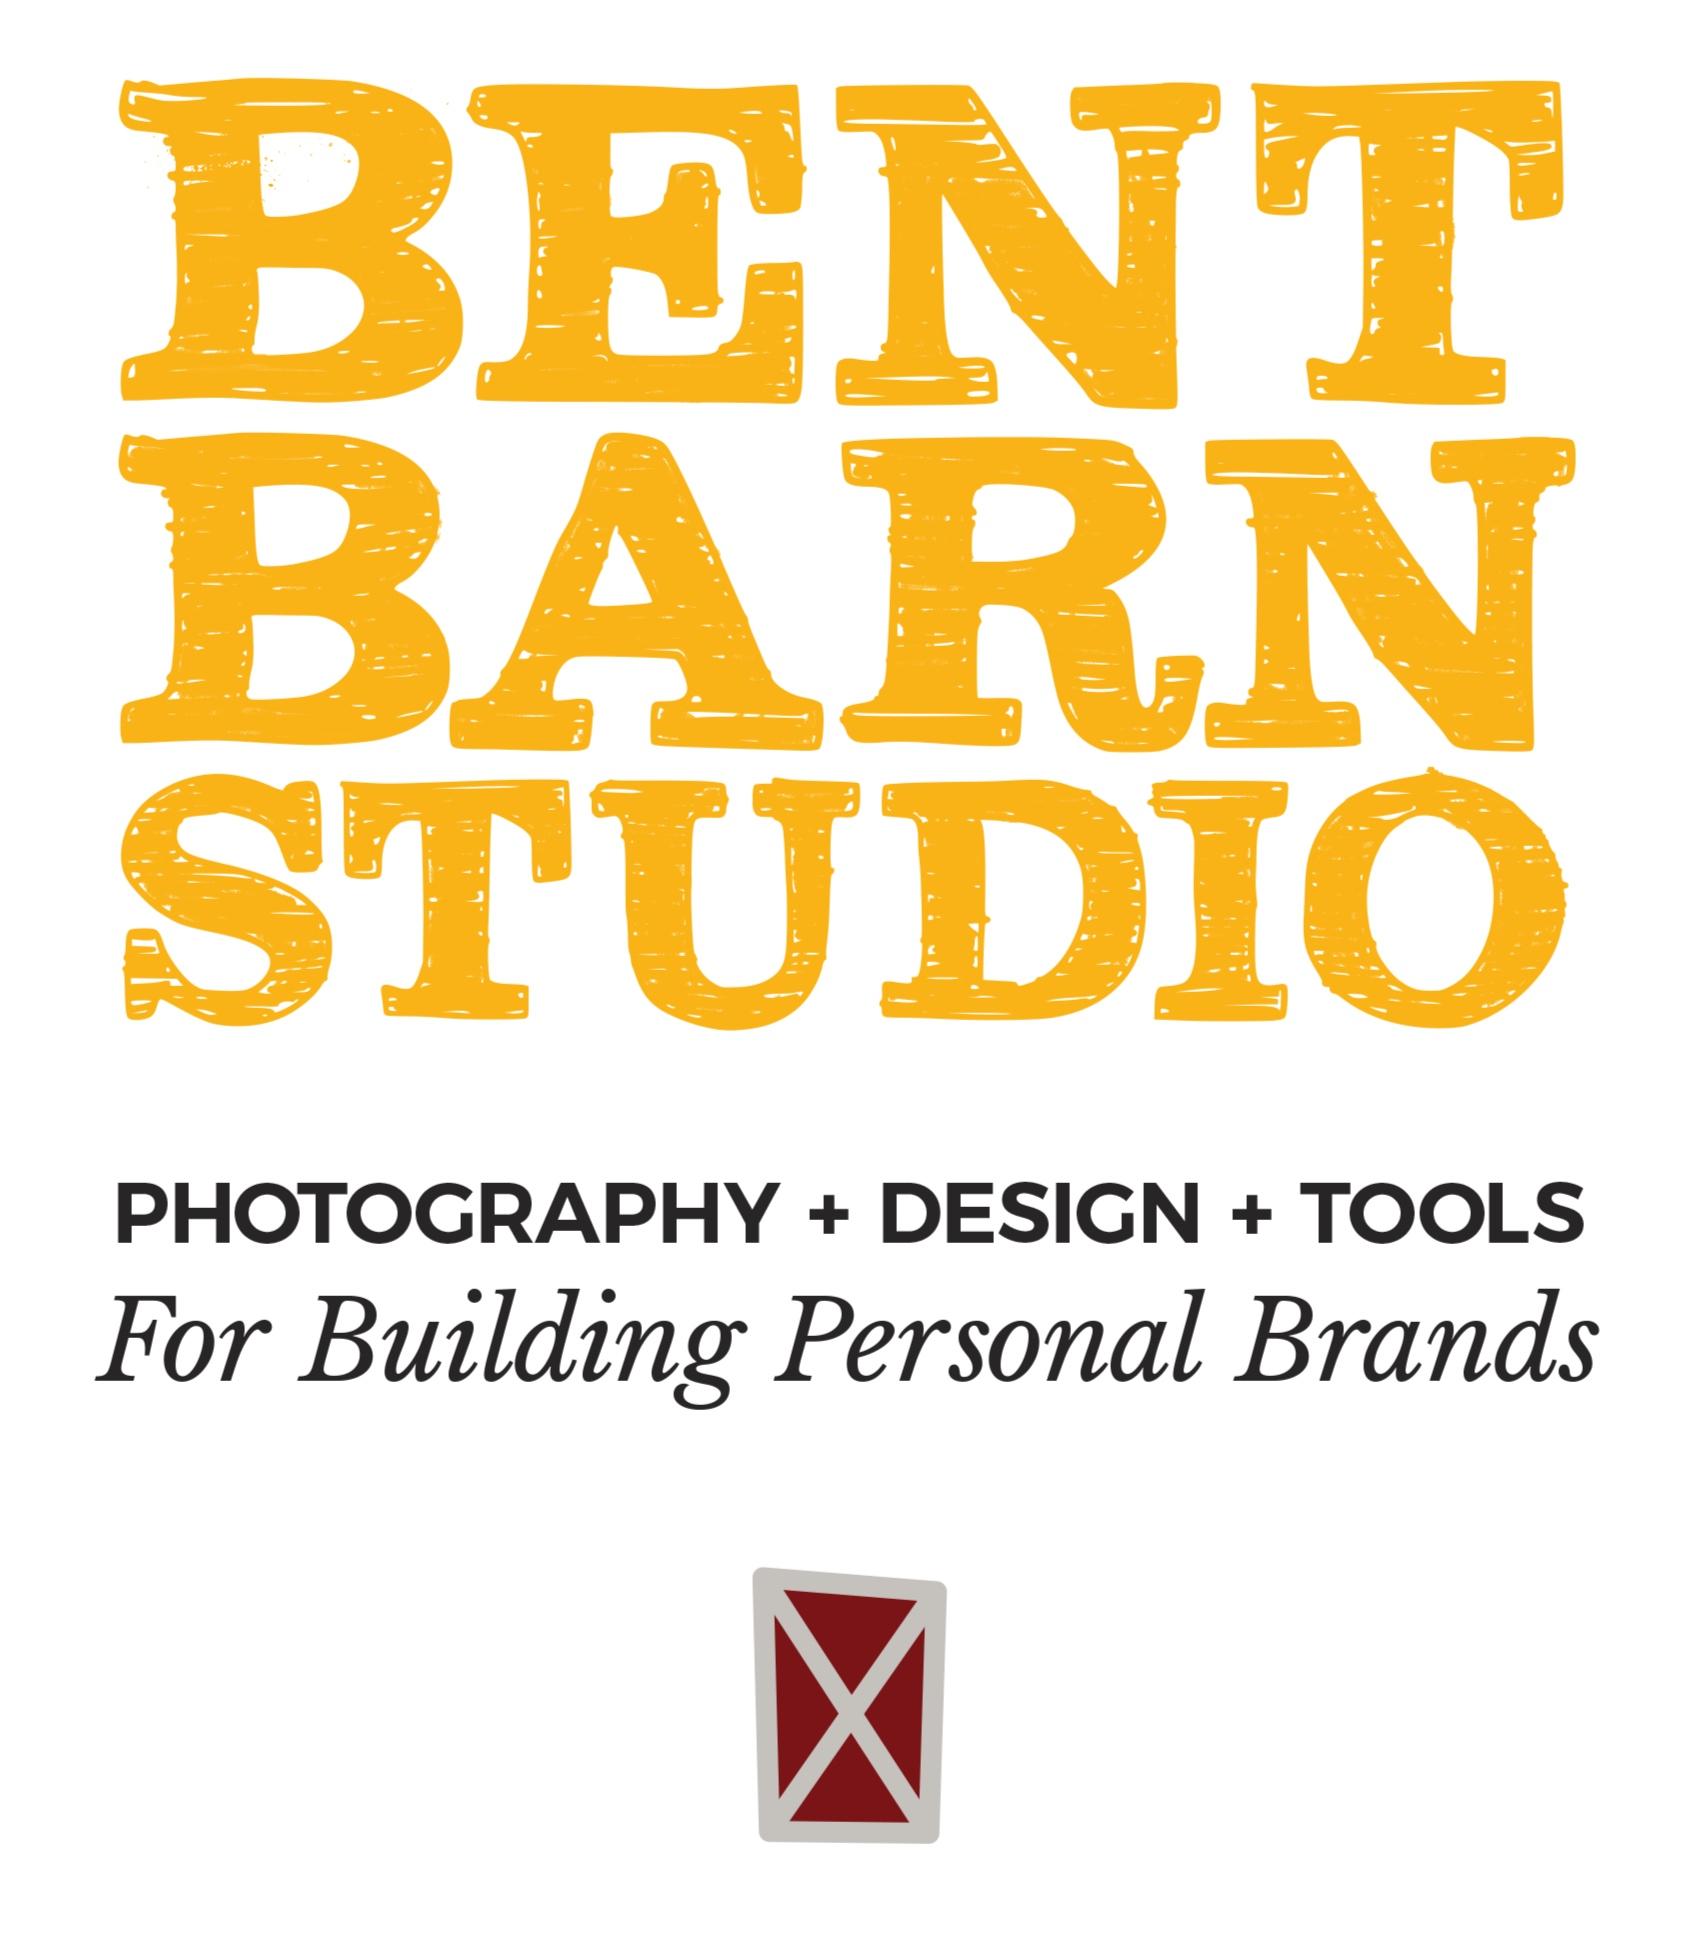 Bent-Barn-Studio_logo-tag_yellow.jpg